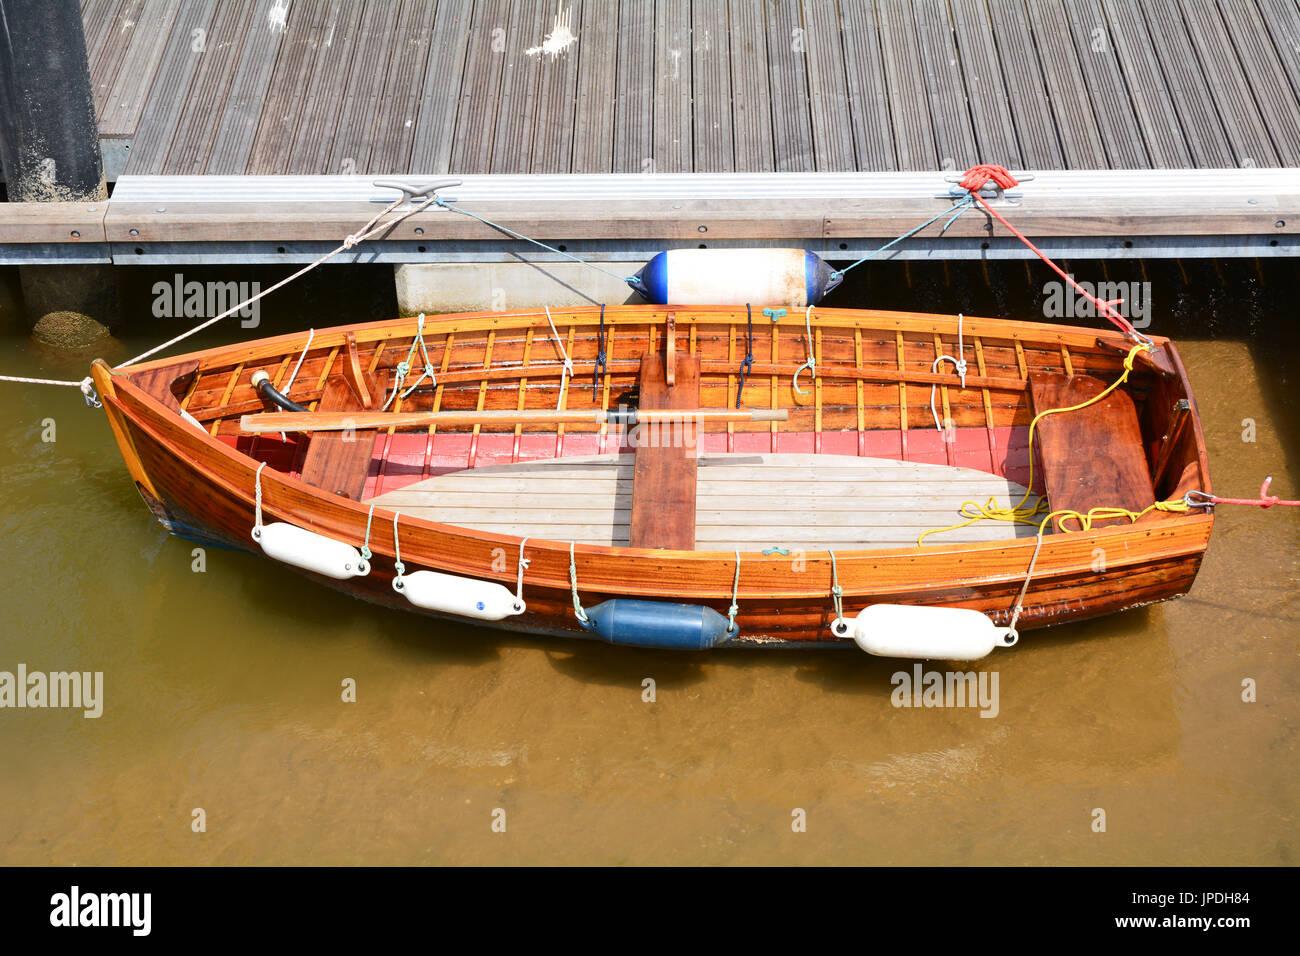 holz ruderboot zum steg festgemacht stockfoto bild 151504308 alamy. Black Bedroom Furniture Sets. Home Design Ideas